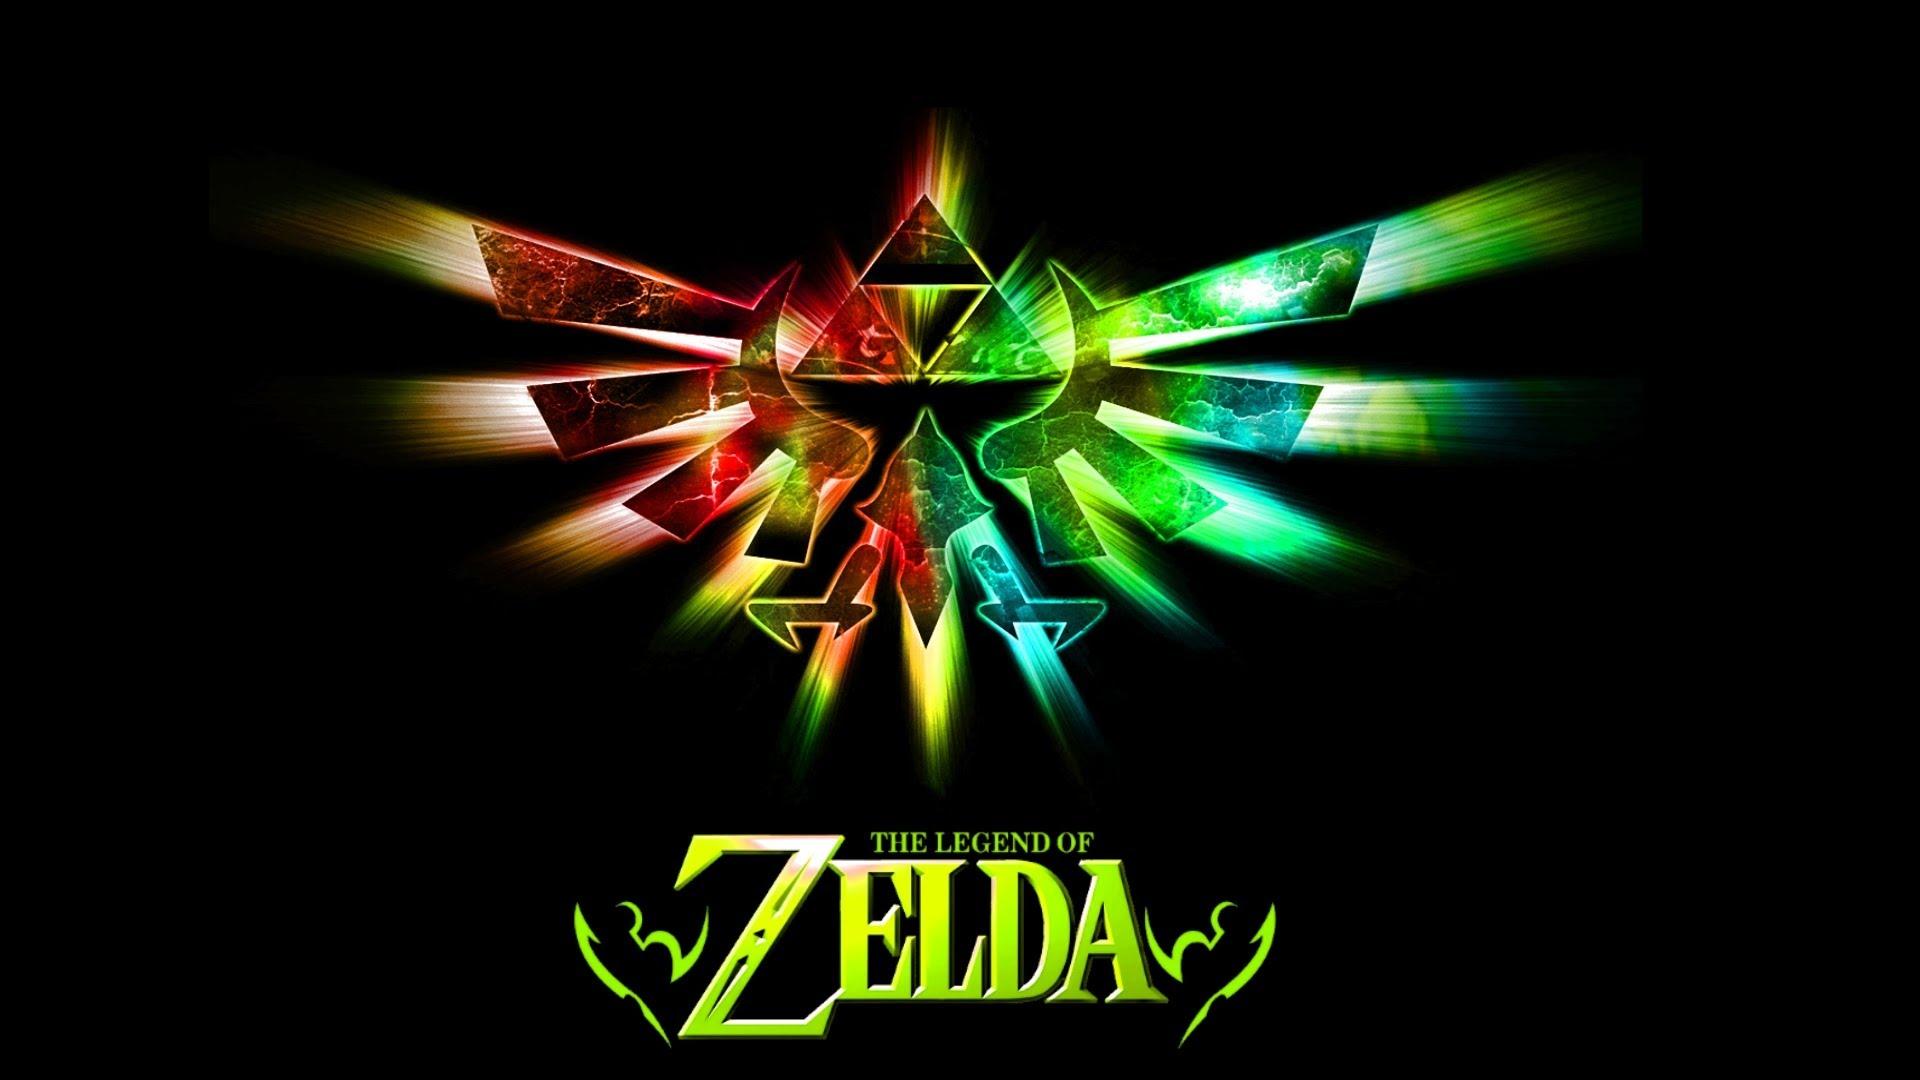 Legend Of Zelda Breath Of The Wild Wallpaper Hd 5 Cosas Que Hacen Legendario A Zelda Aki Monogatari